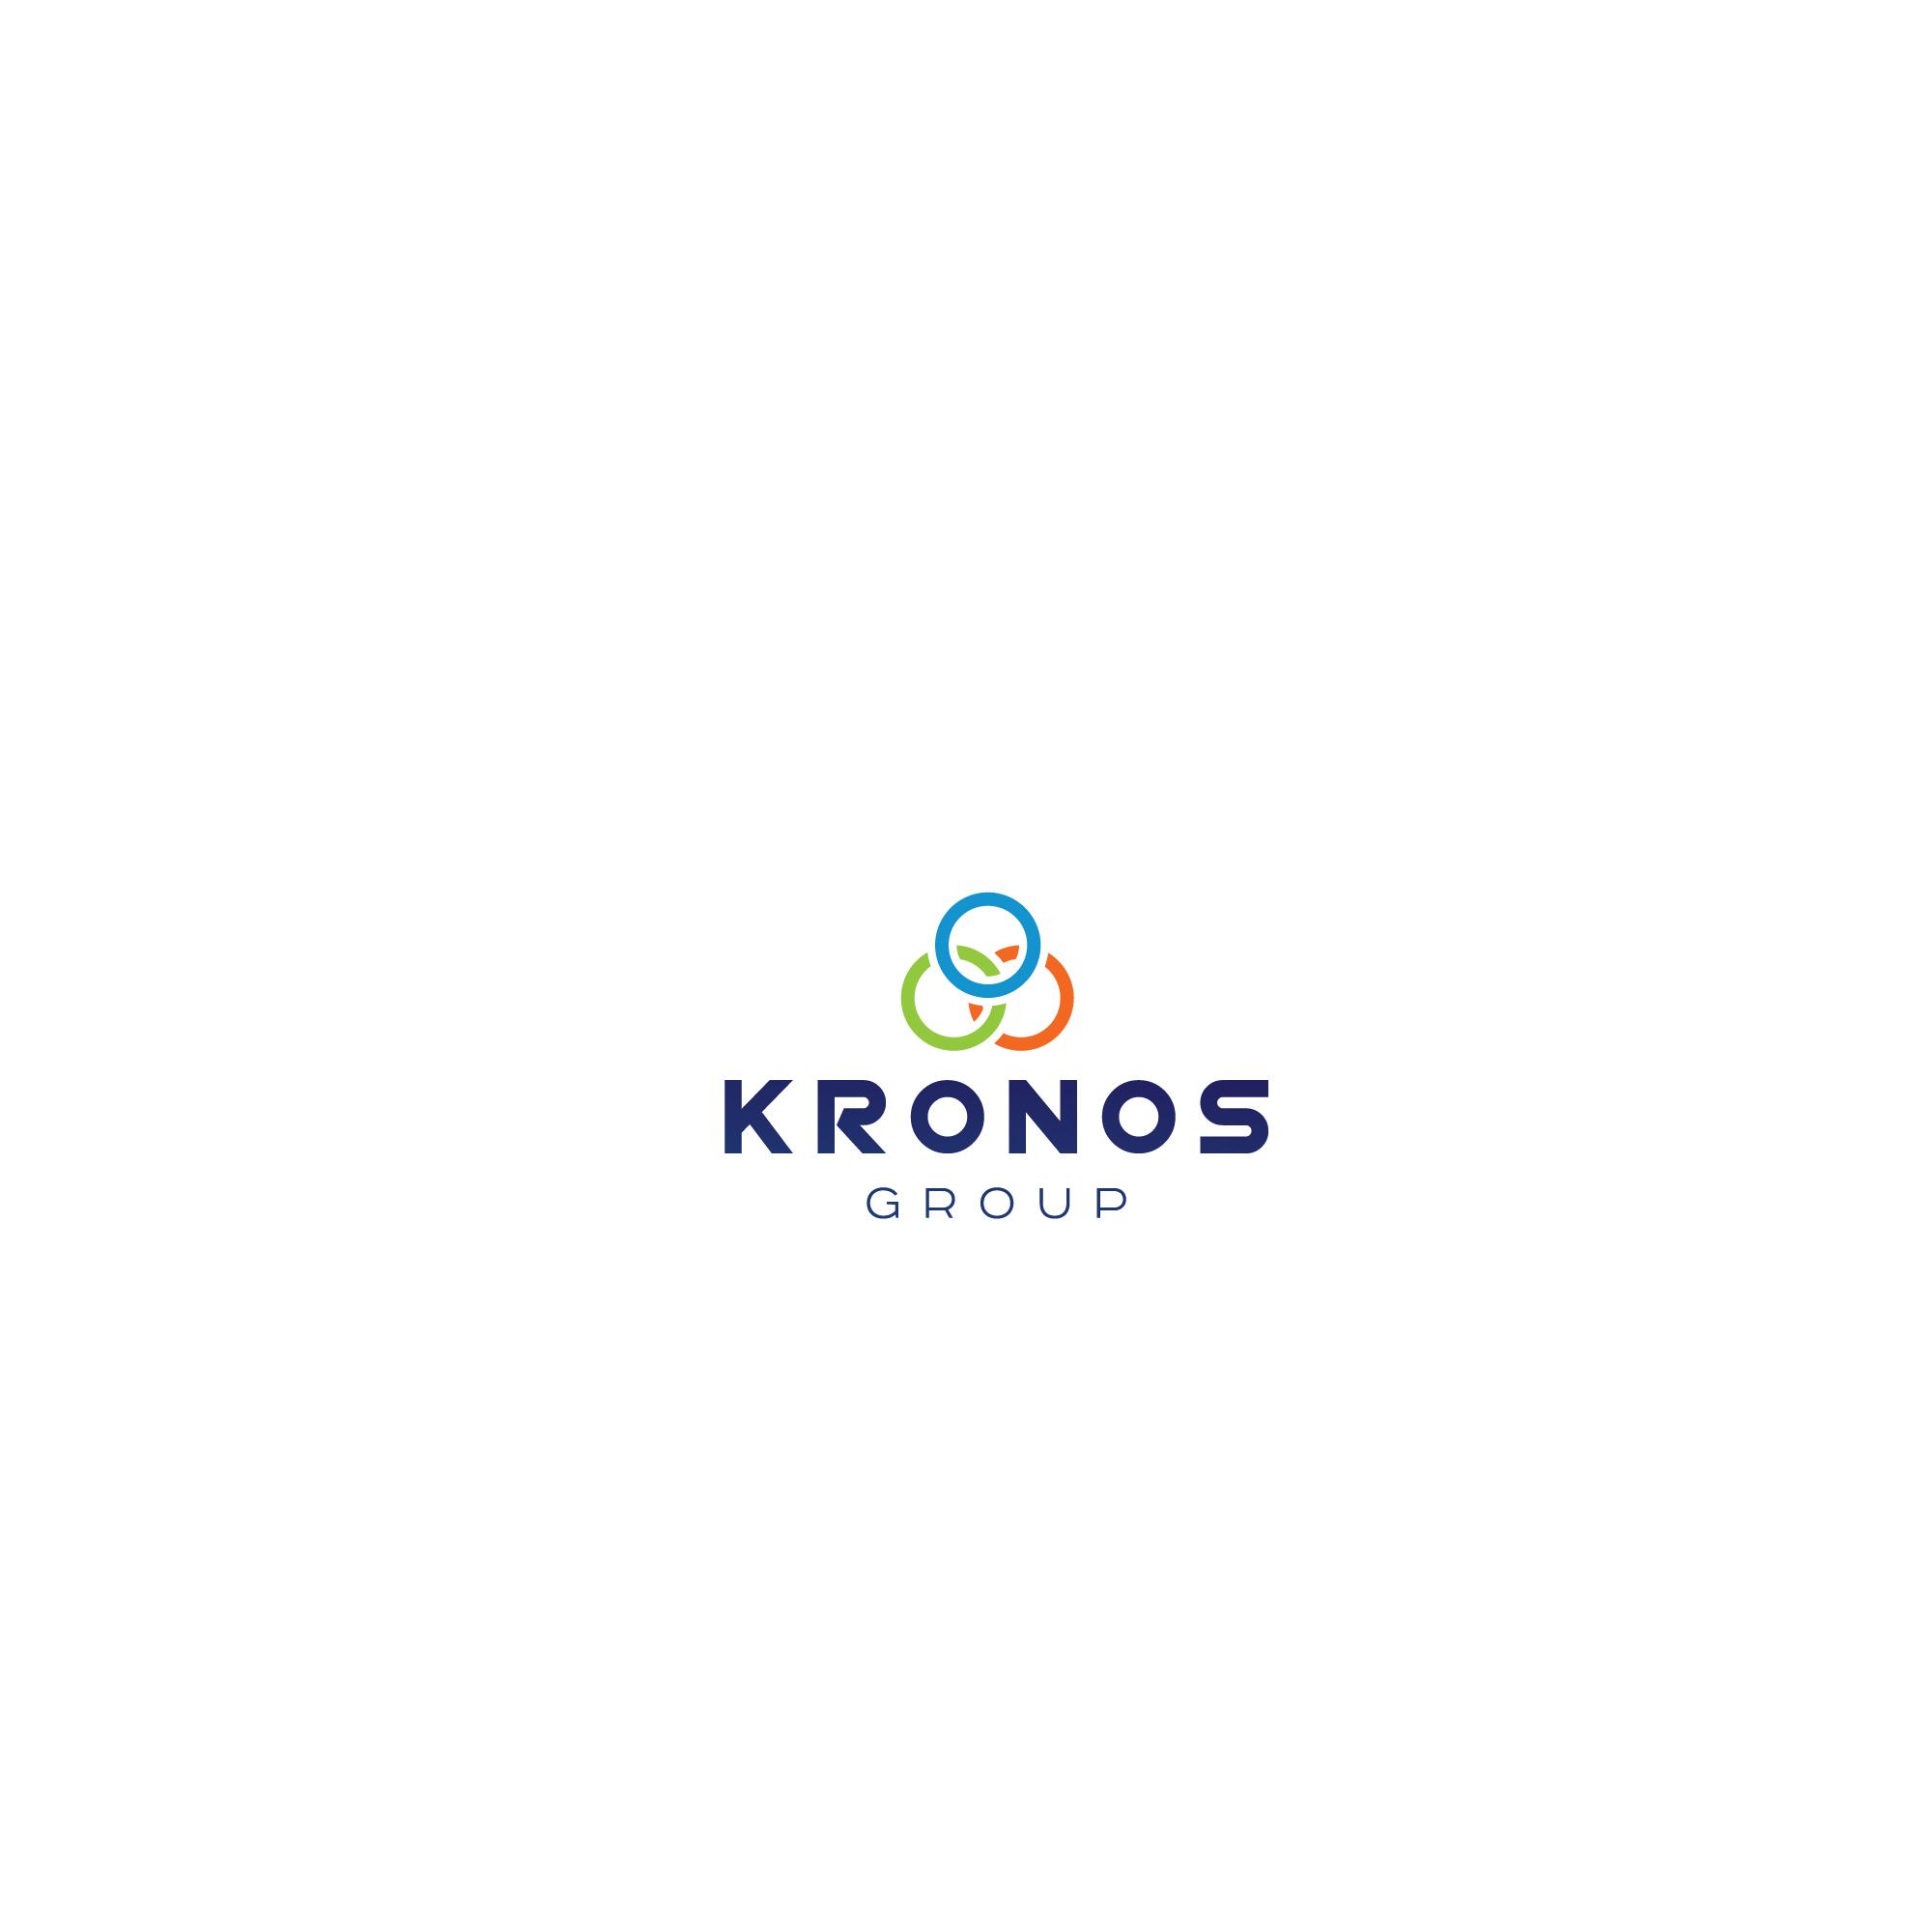 Разработать логотип KRONOS фото f_5475faf16798ab63.jpg